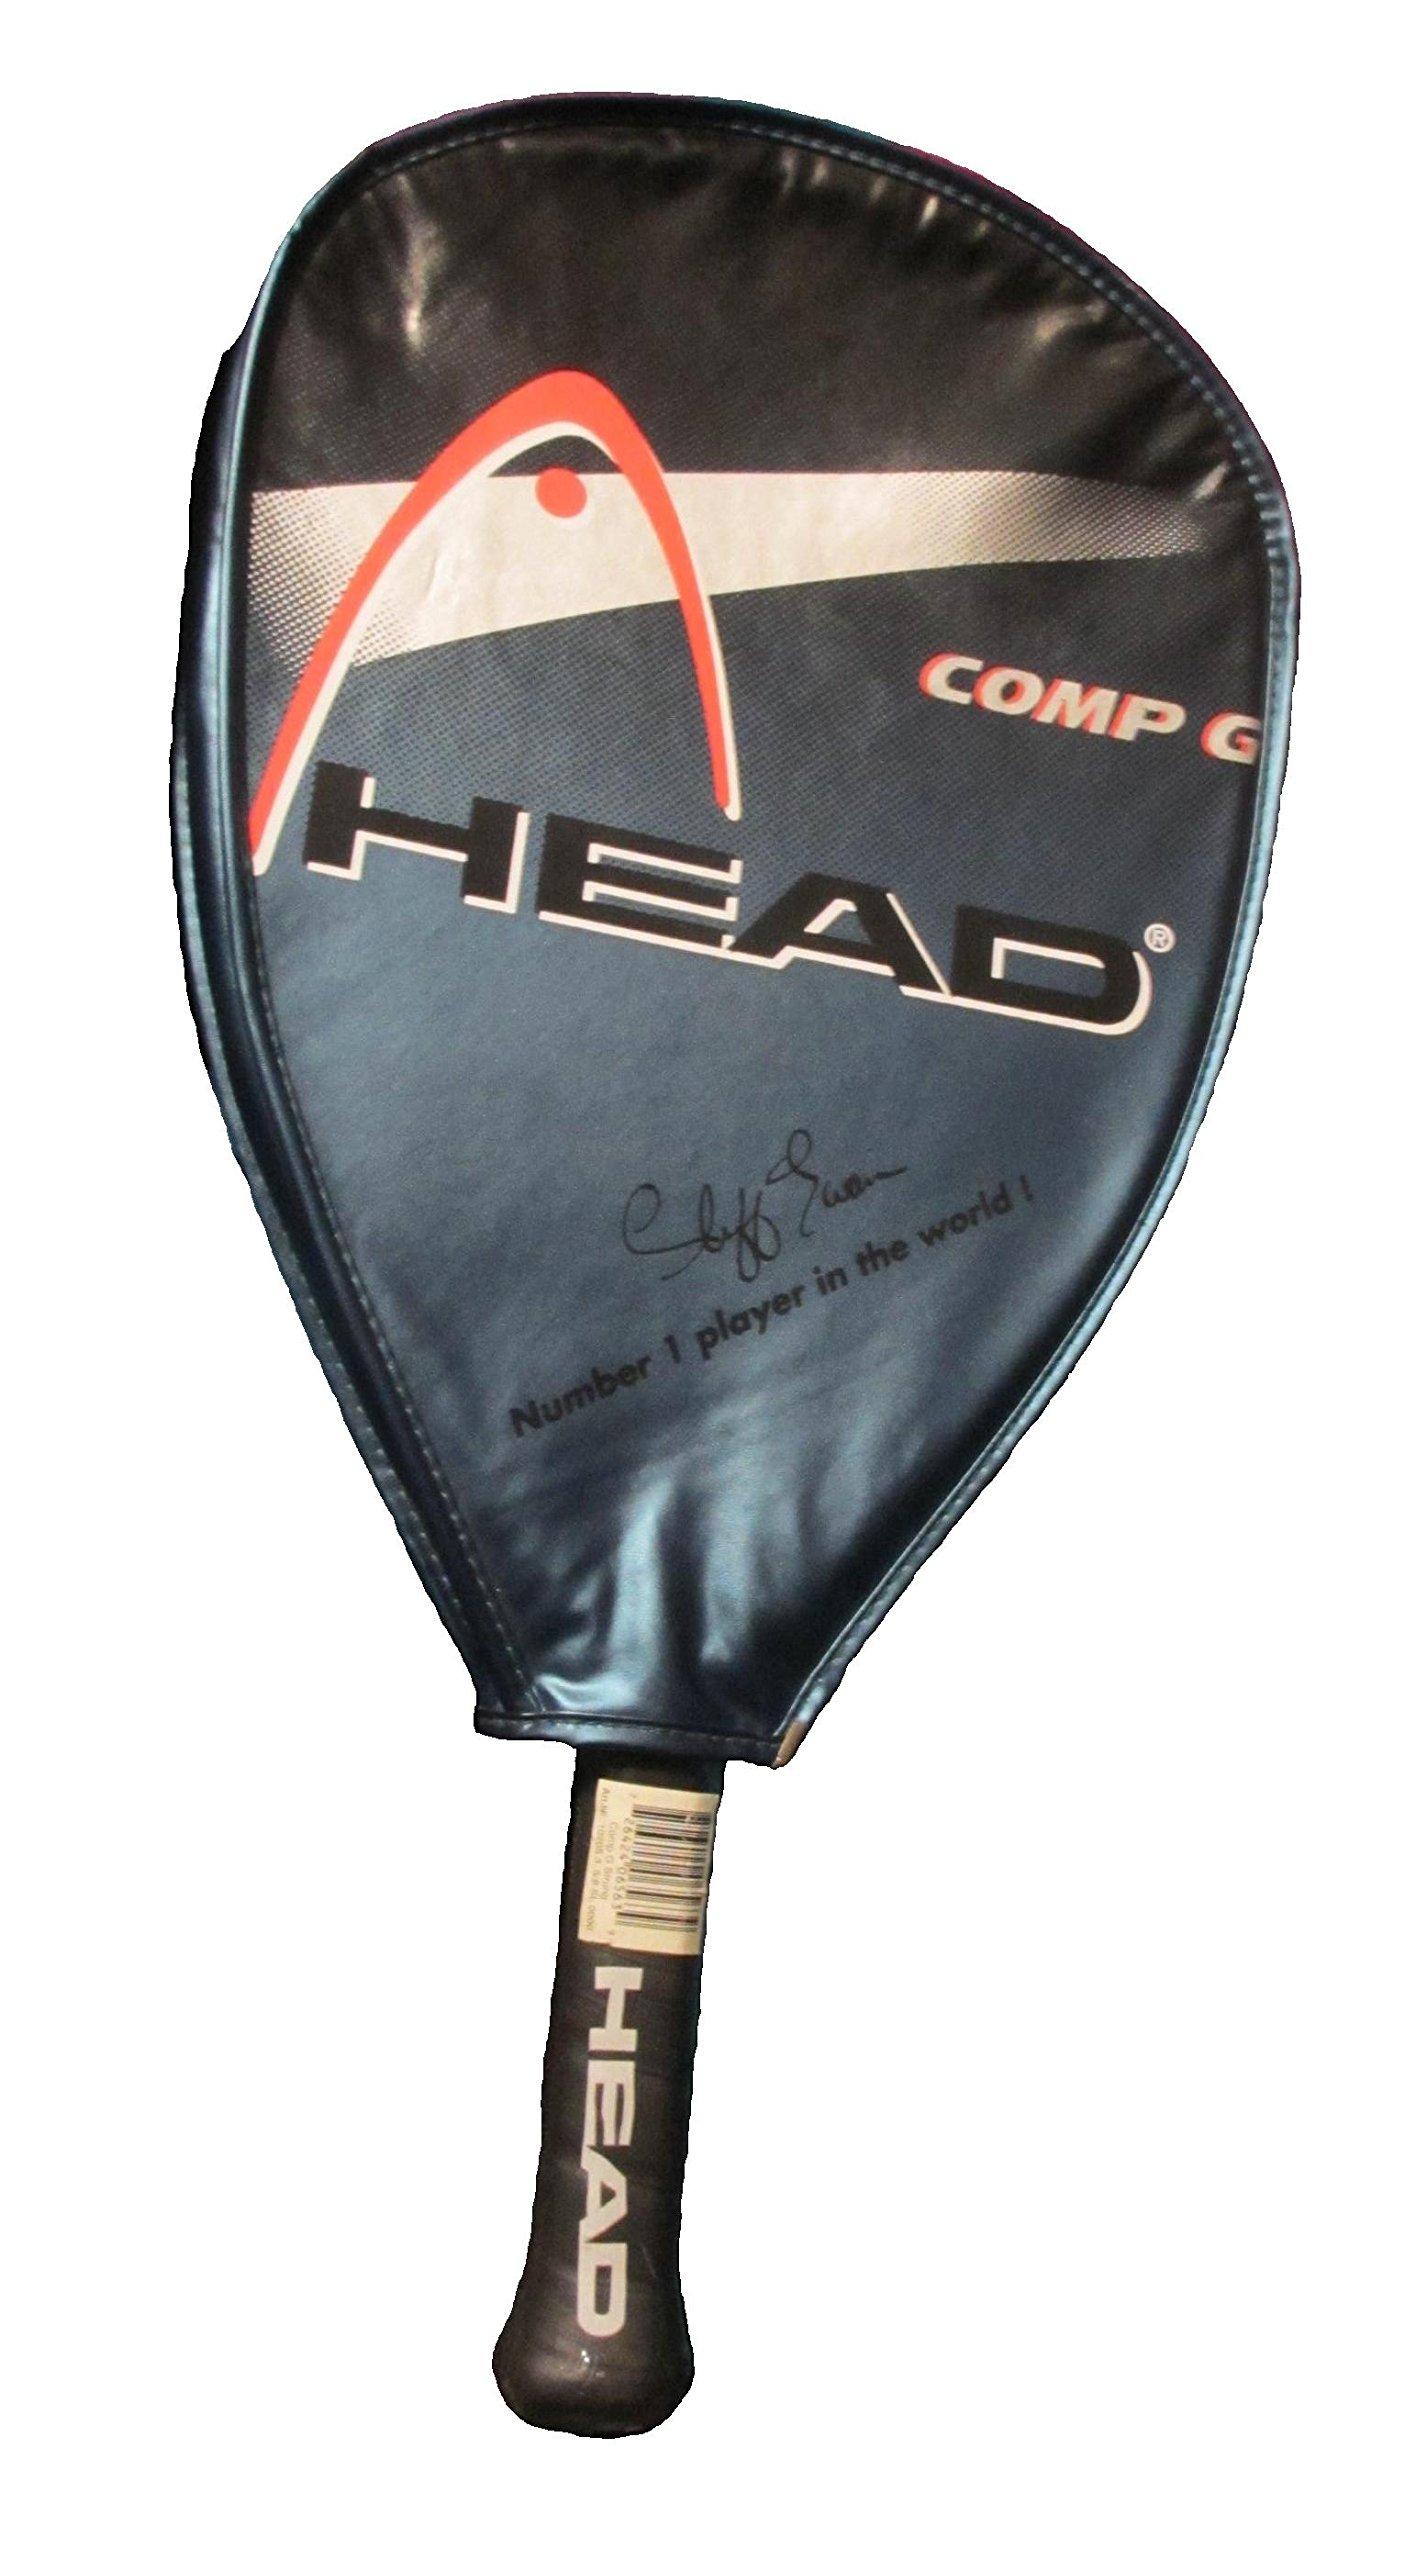 Head Racquetball Racket, Comp G